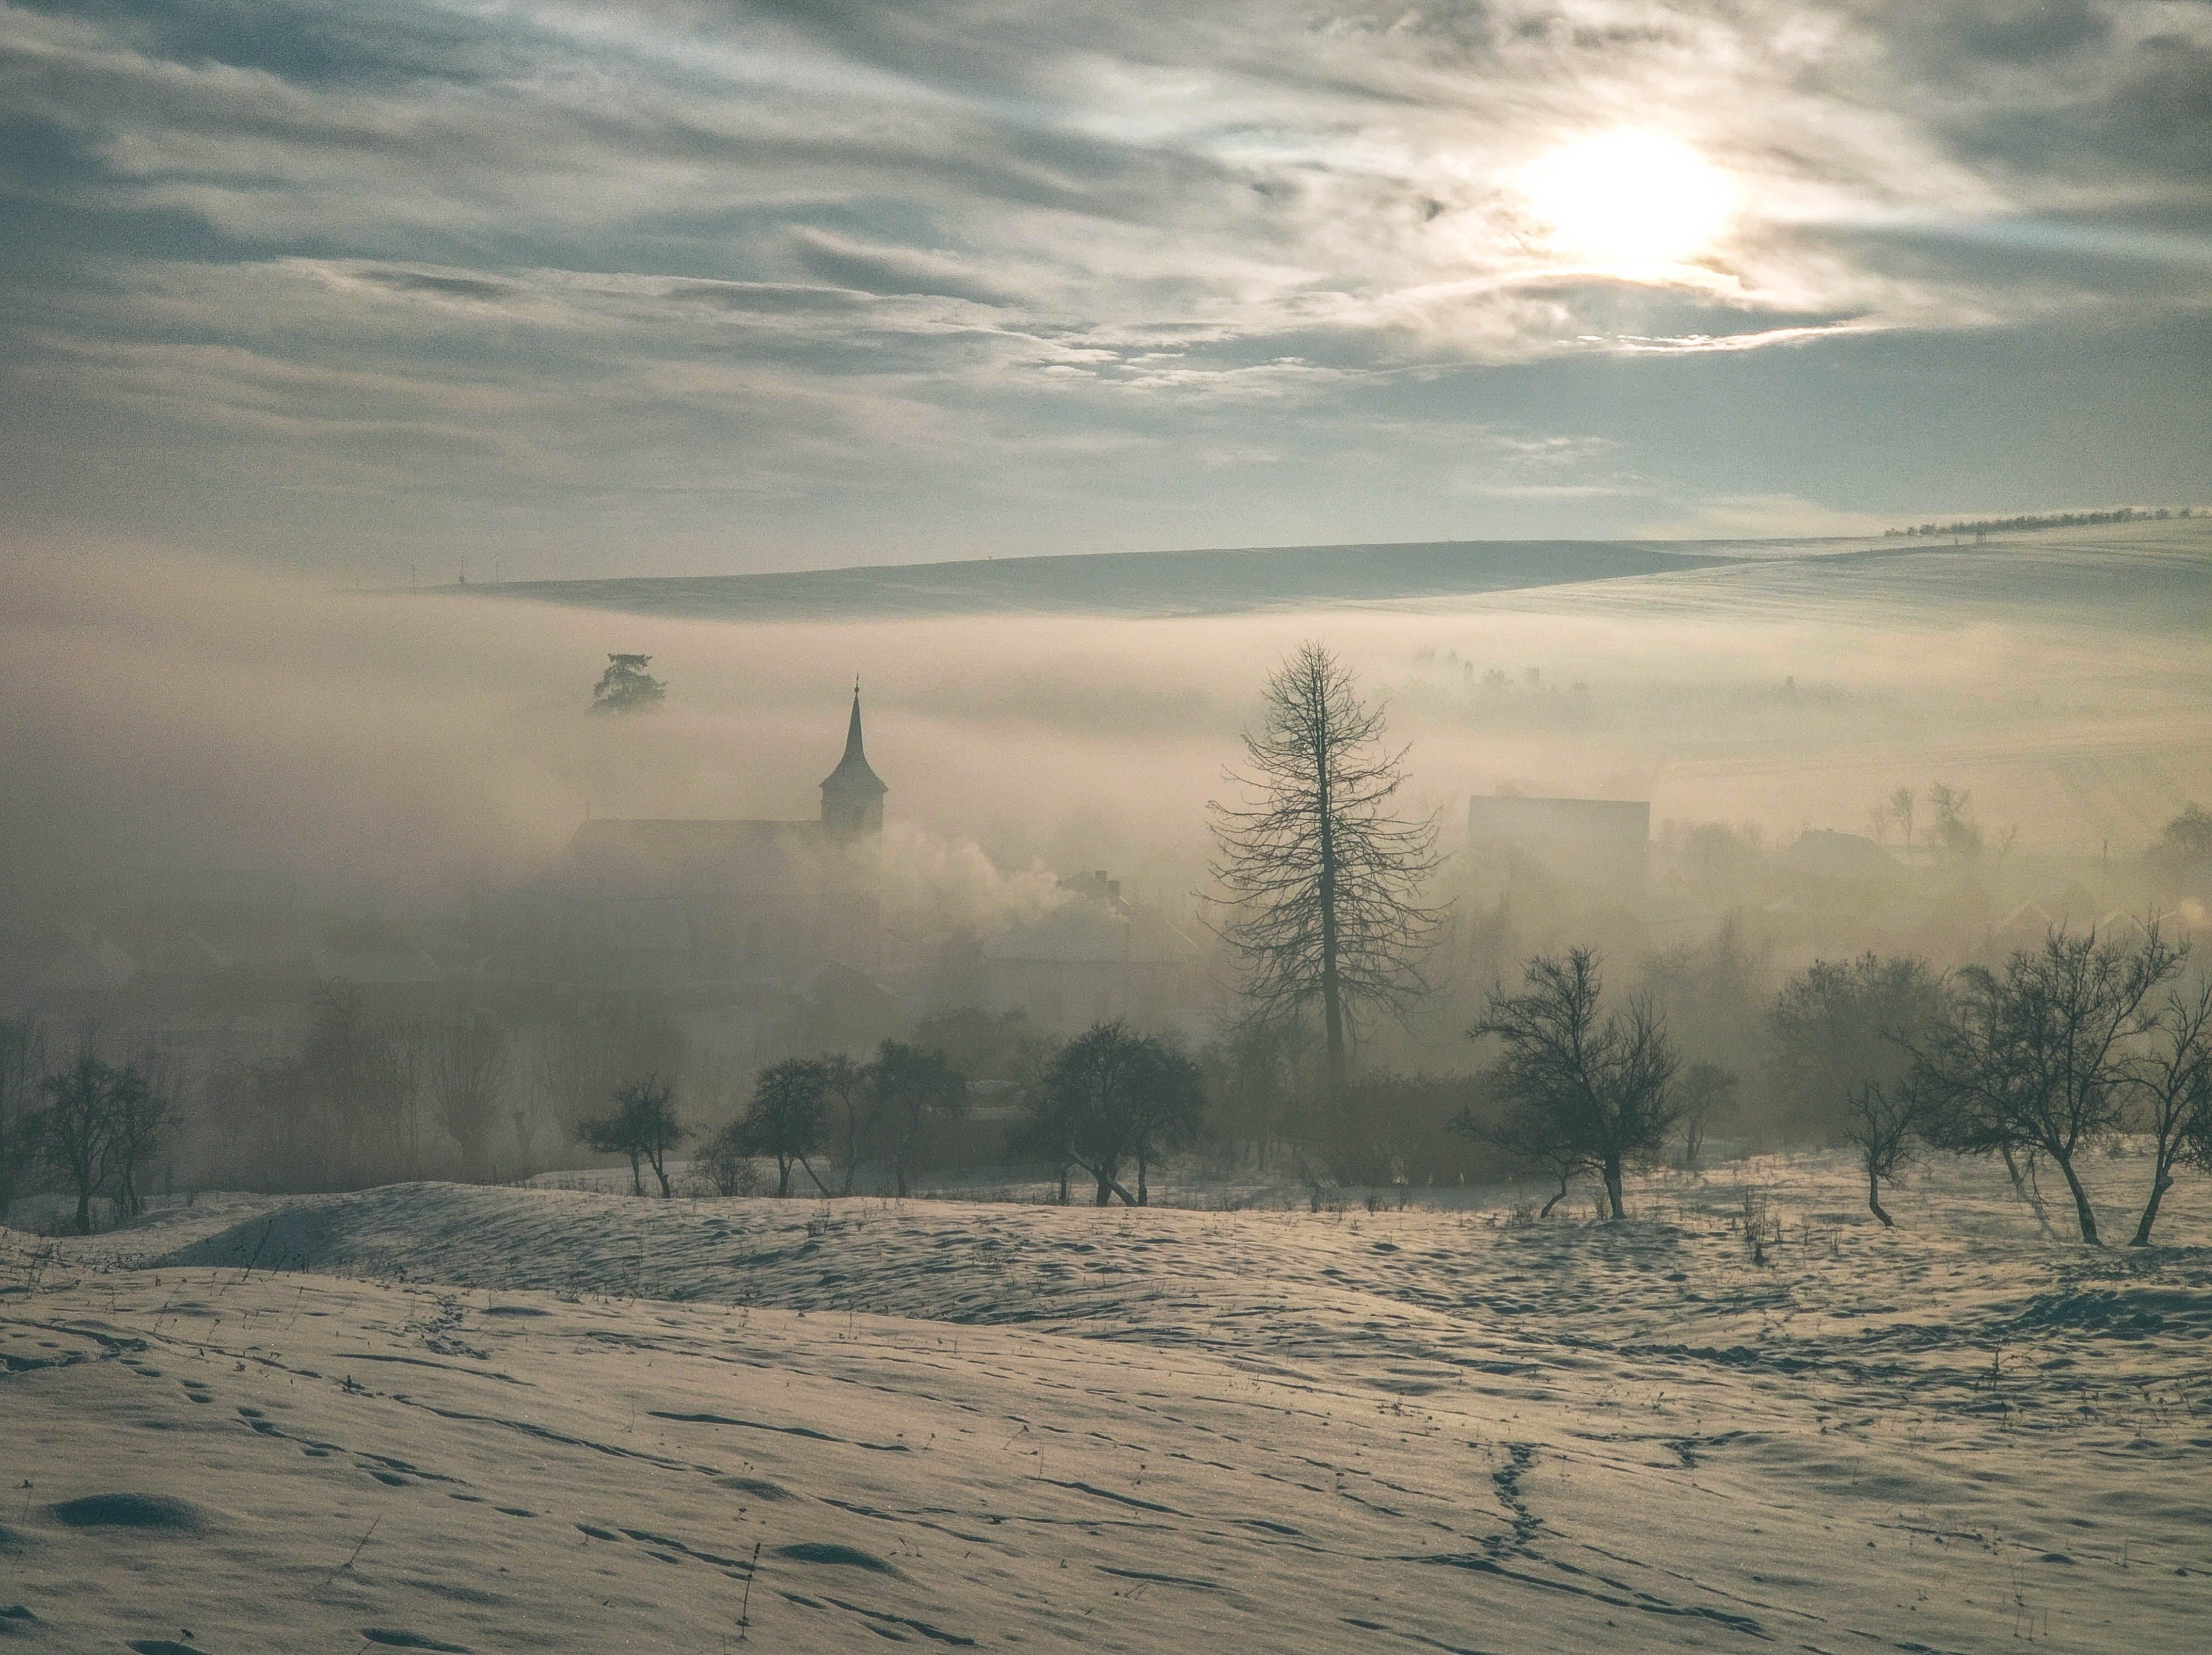 Free stock photo of church, cold, fog, pine tree